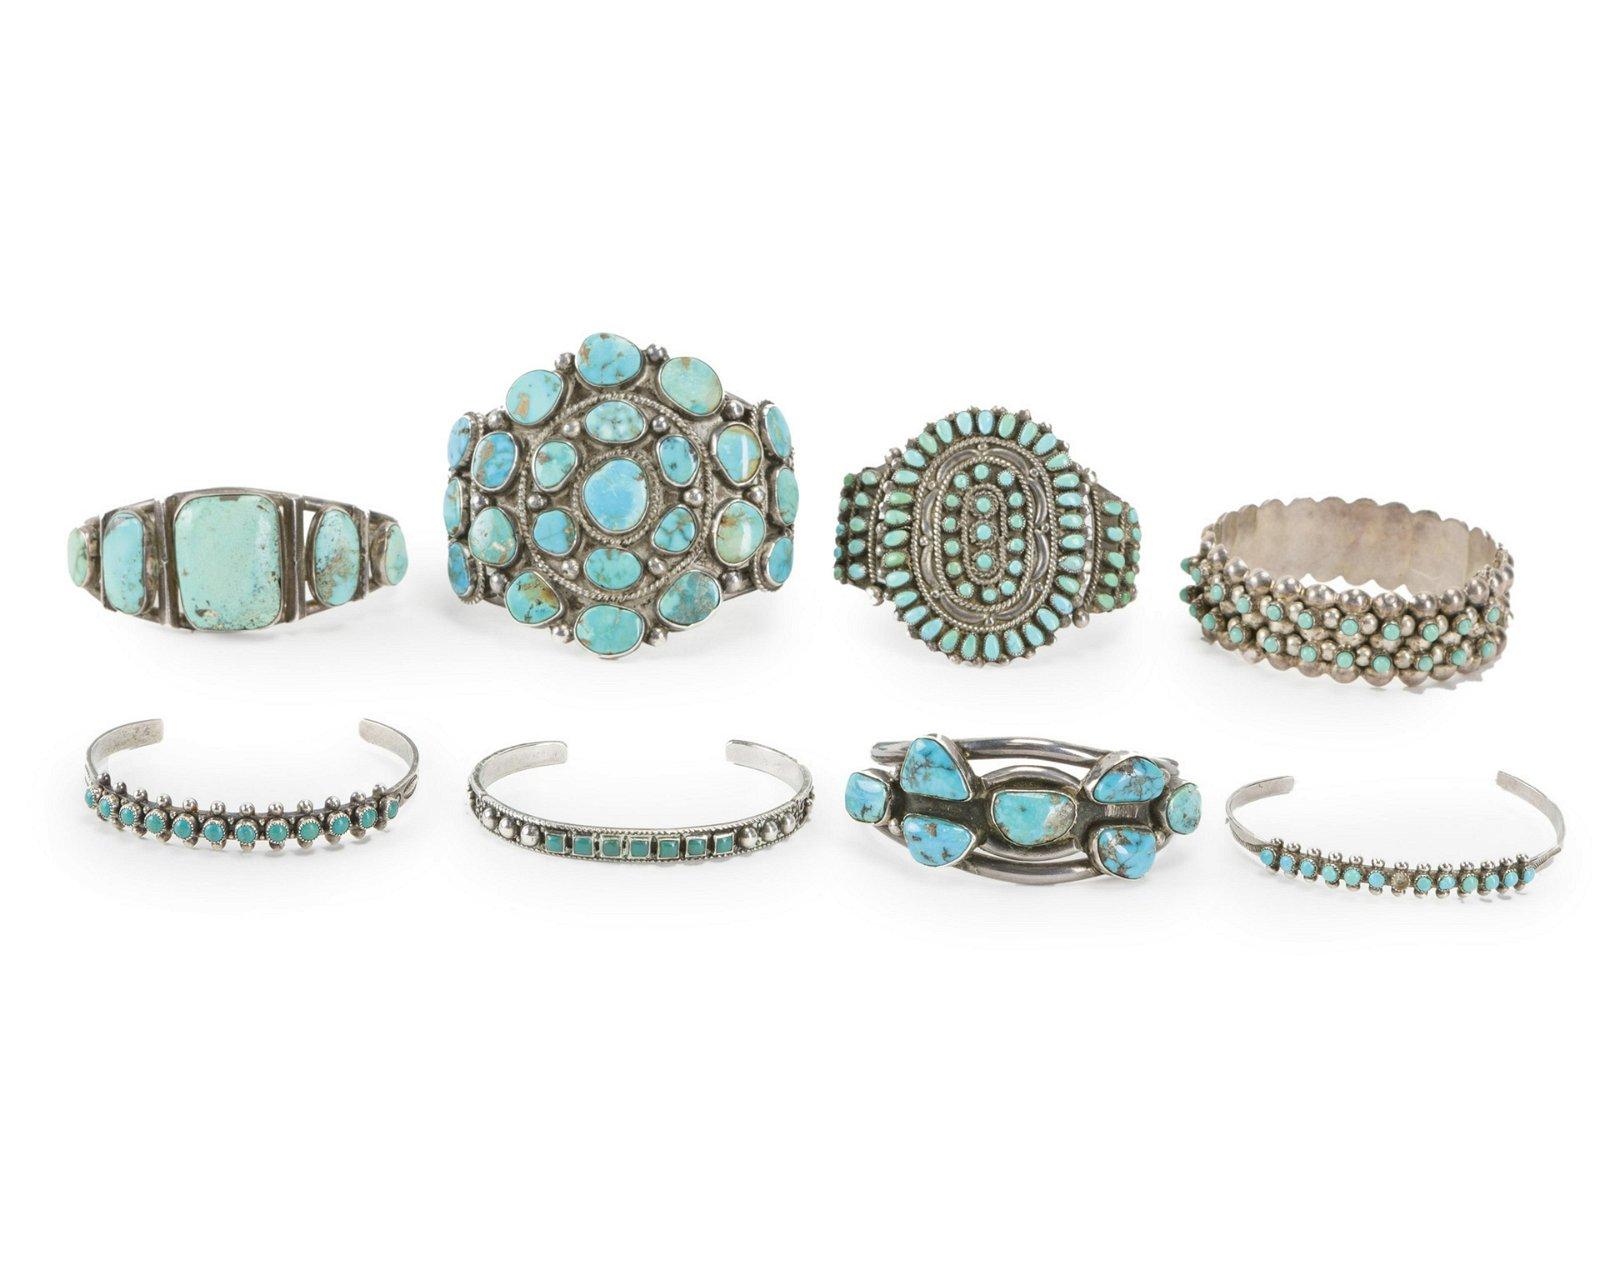 A group of silver cuff bracelets